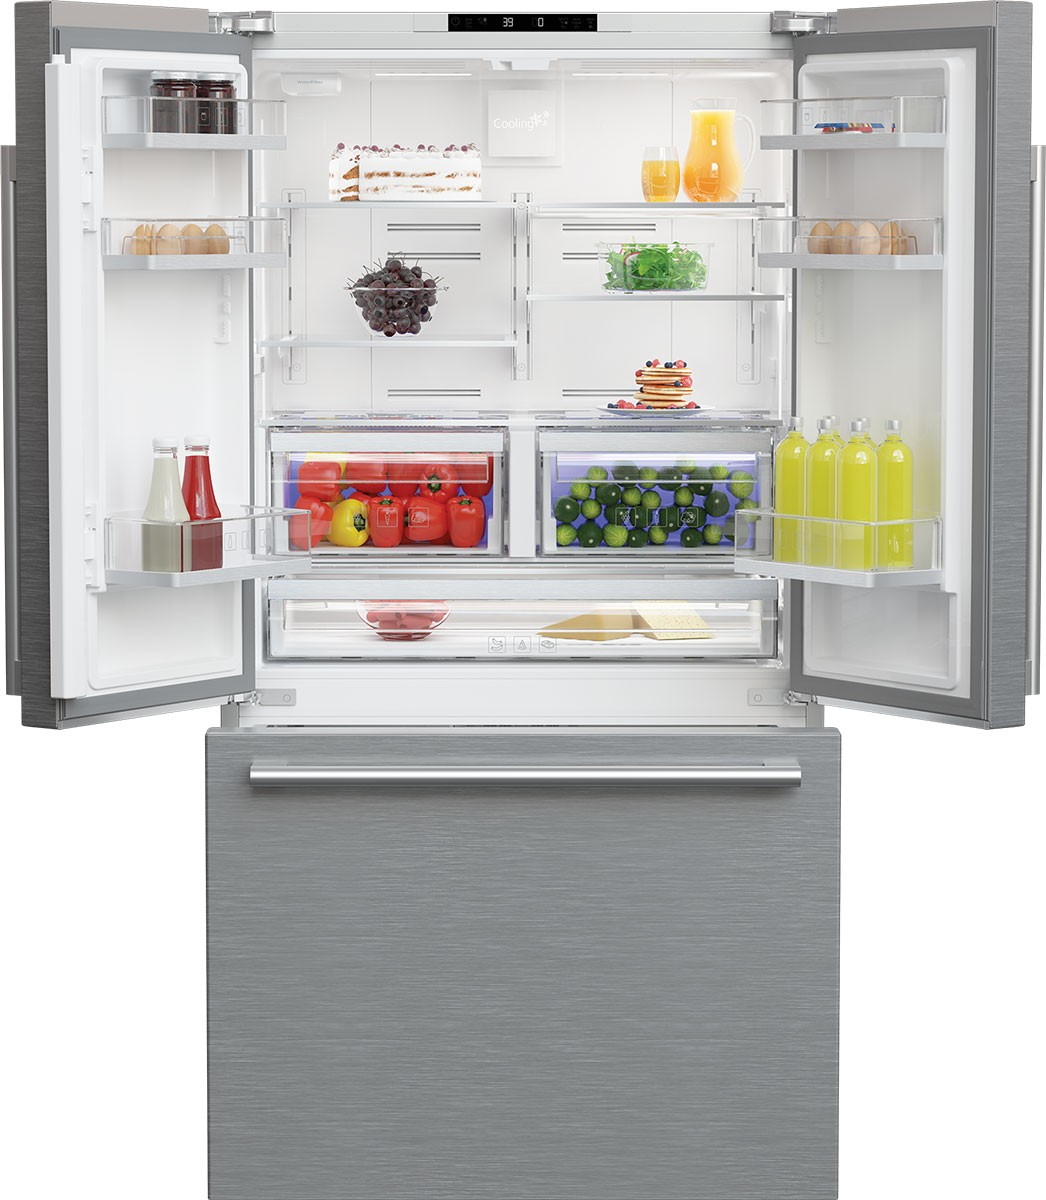 36 Inch Counter Depth French Door Refrigerator Blomberg